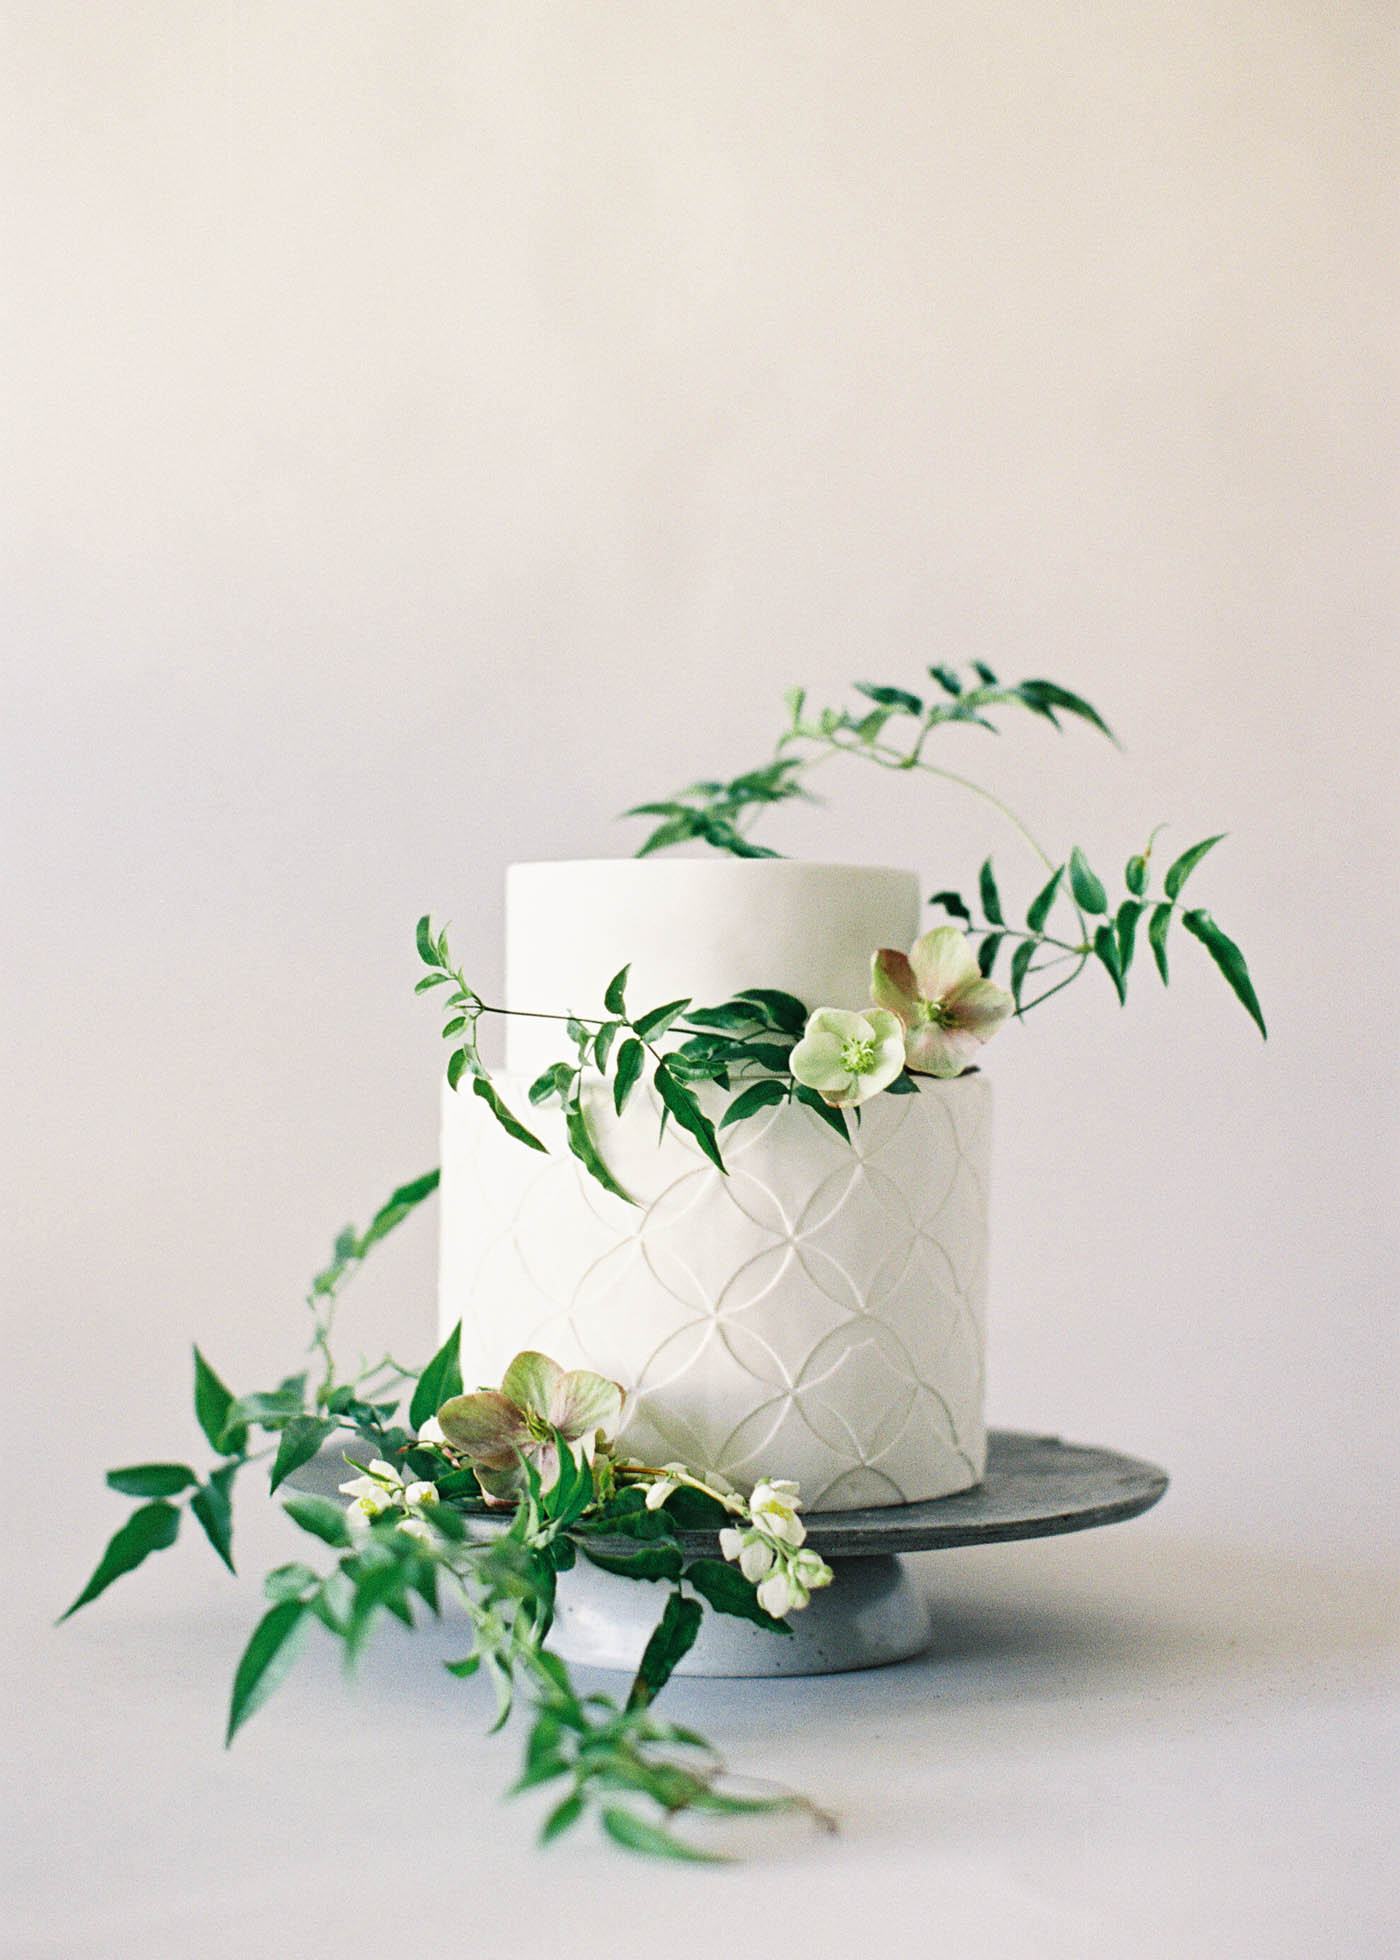 naturalist-cakes-6-Jen_Huang-000486-R1-031-14.jpg